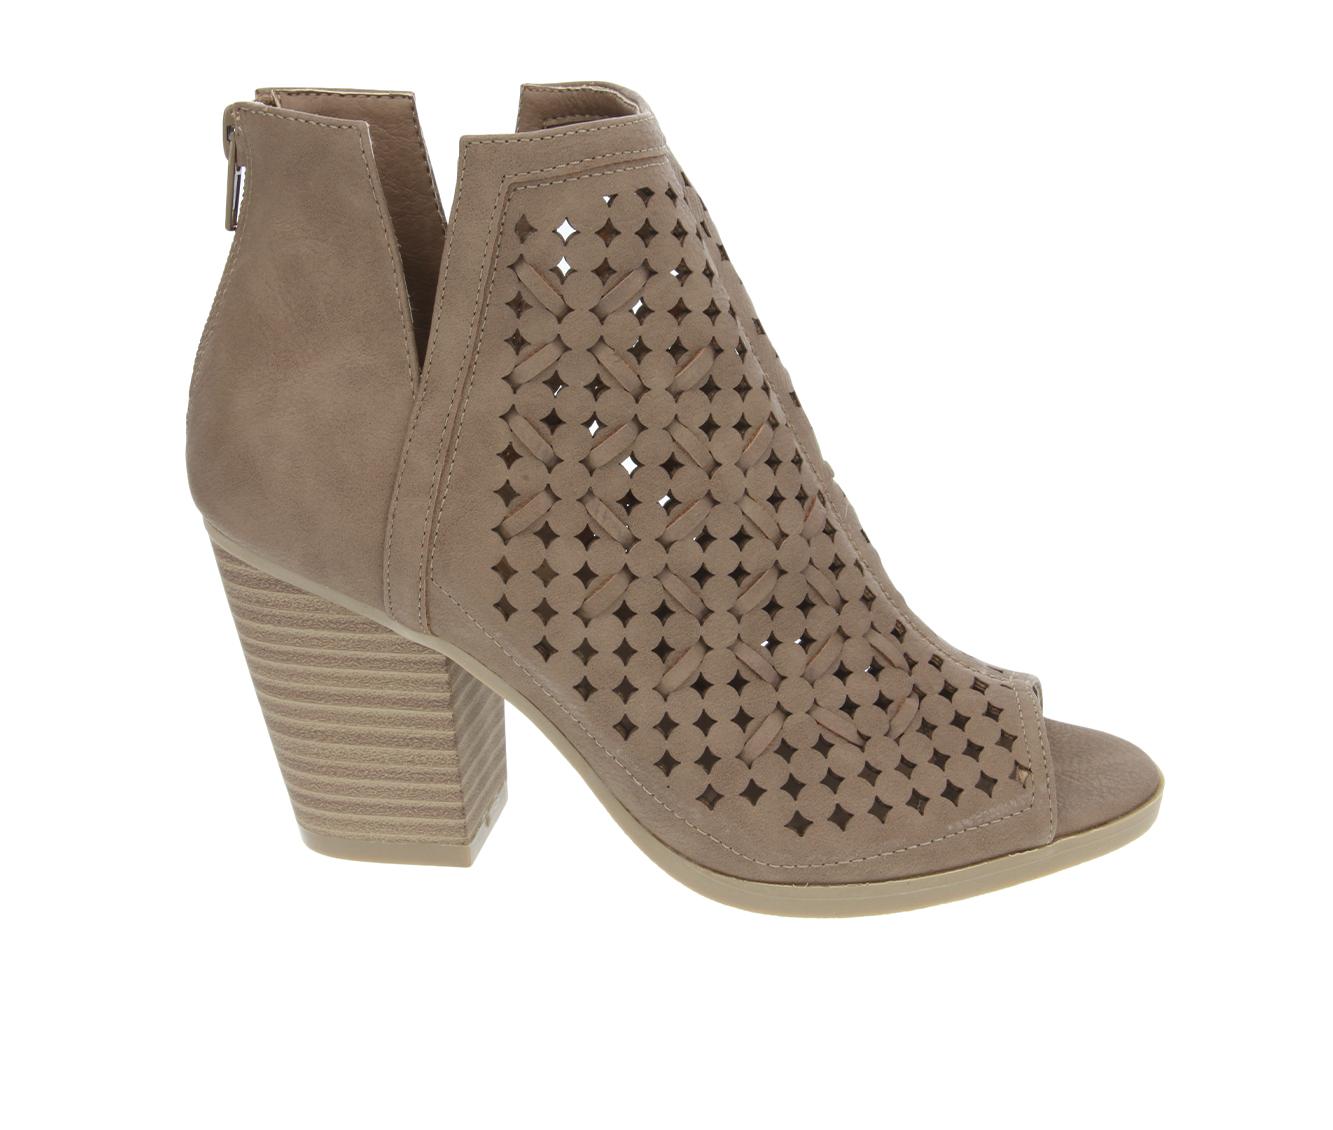 Sugar Vael 3 Women's Boot (Beige Faux Leather)